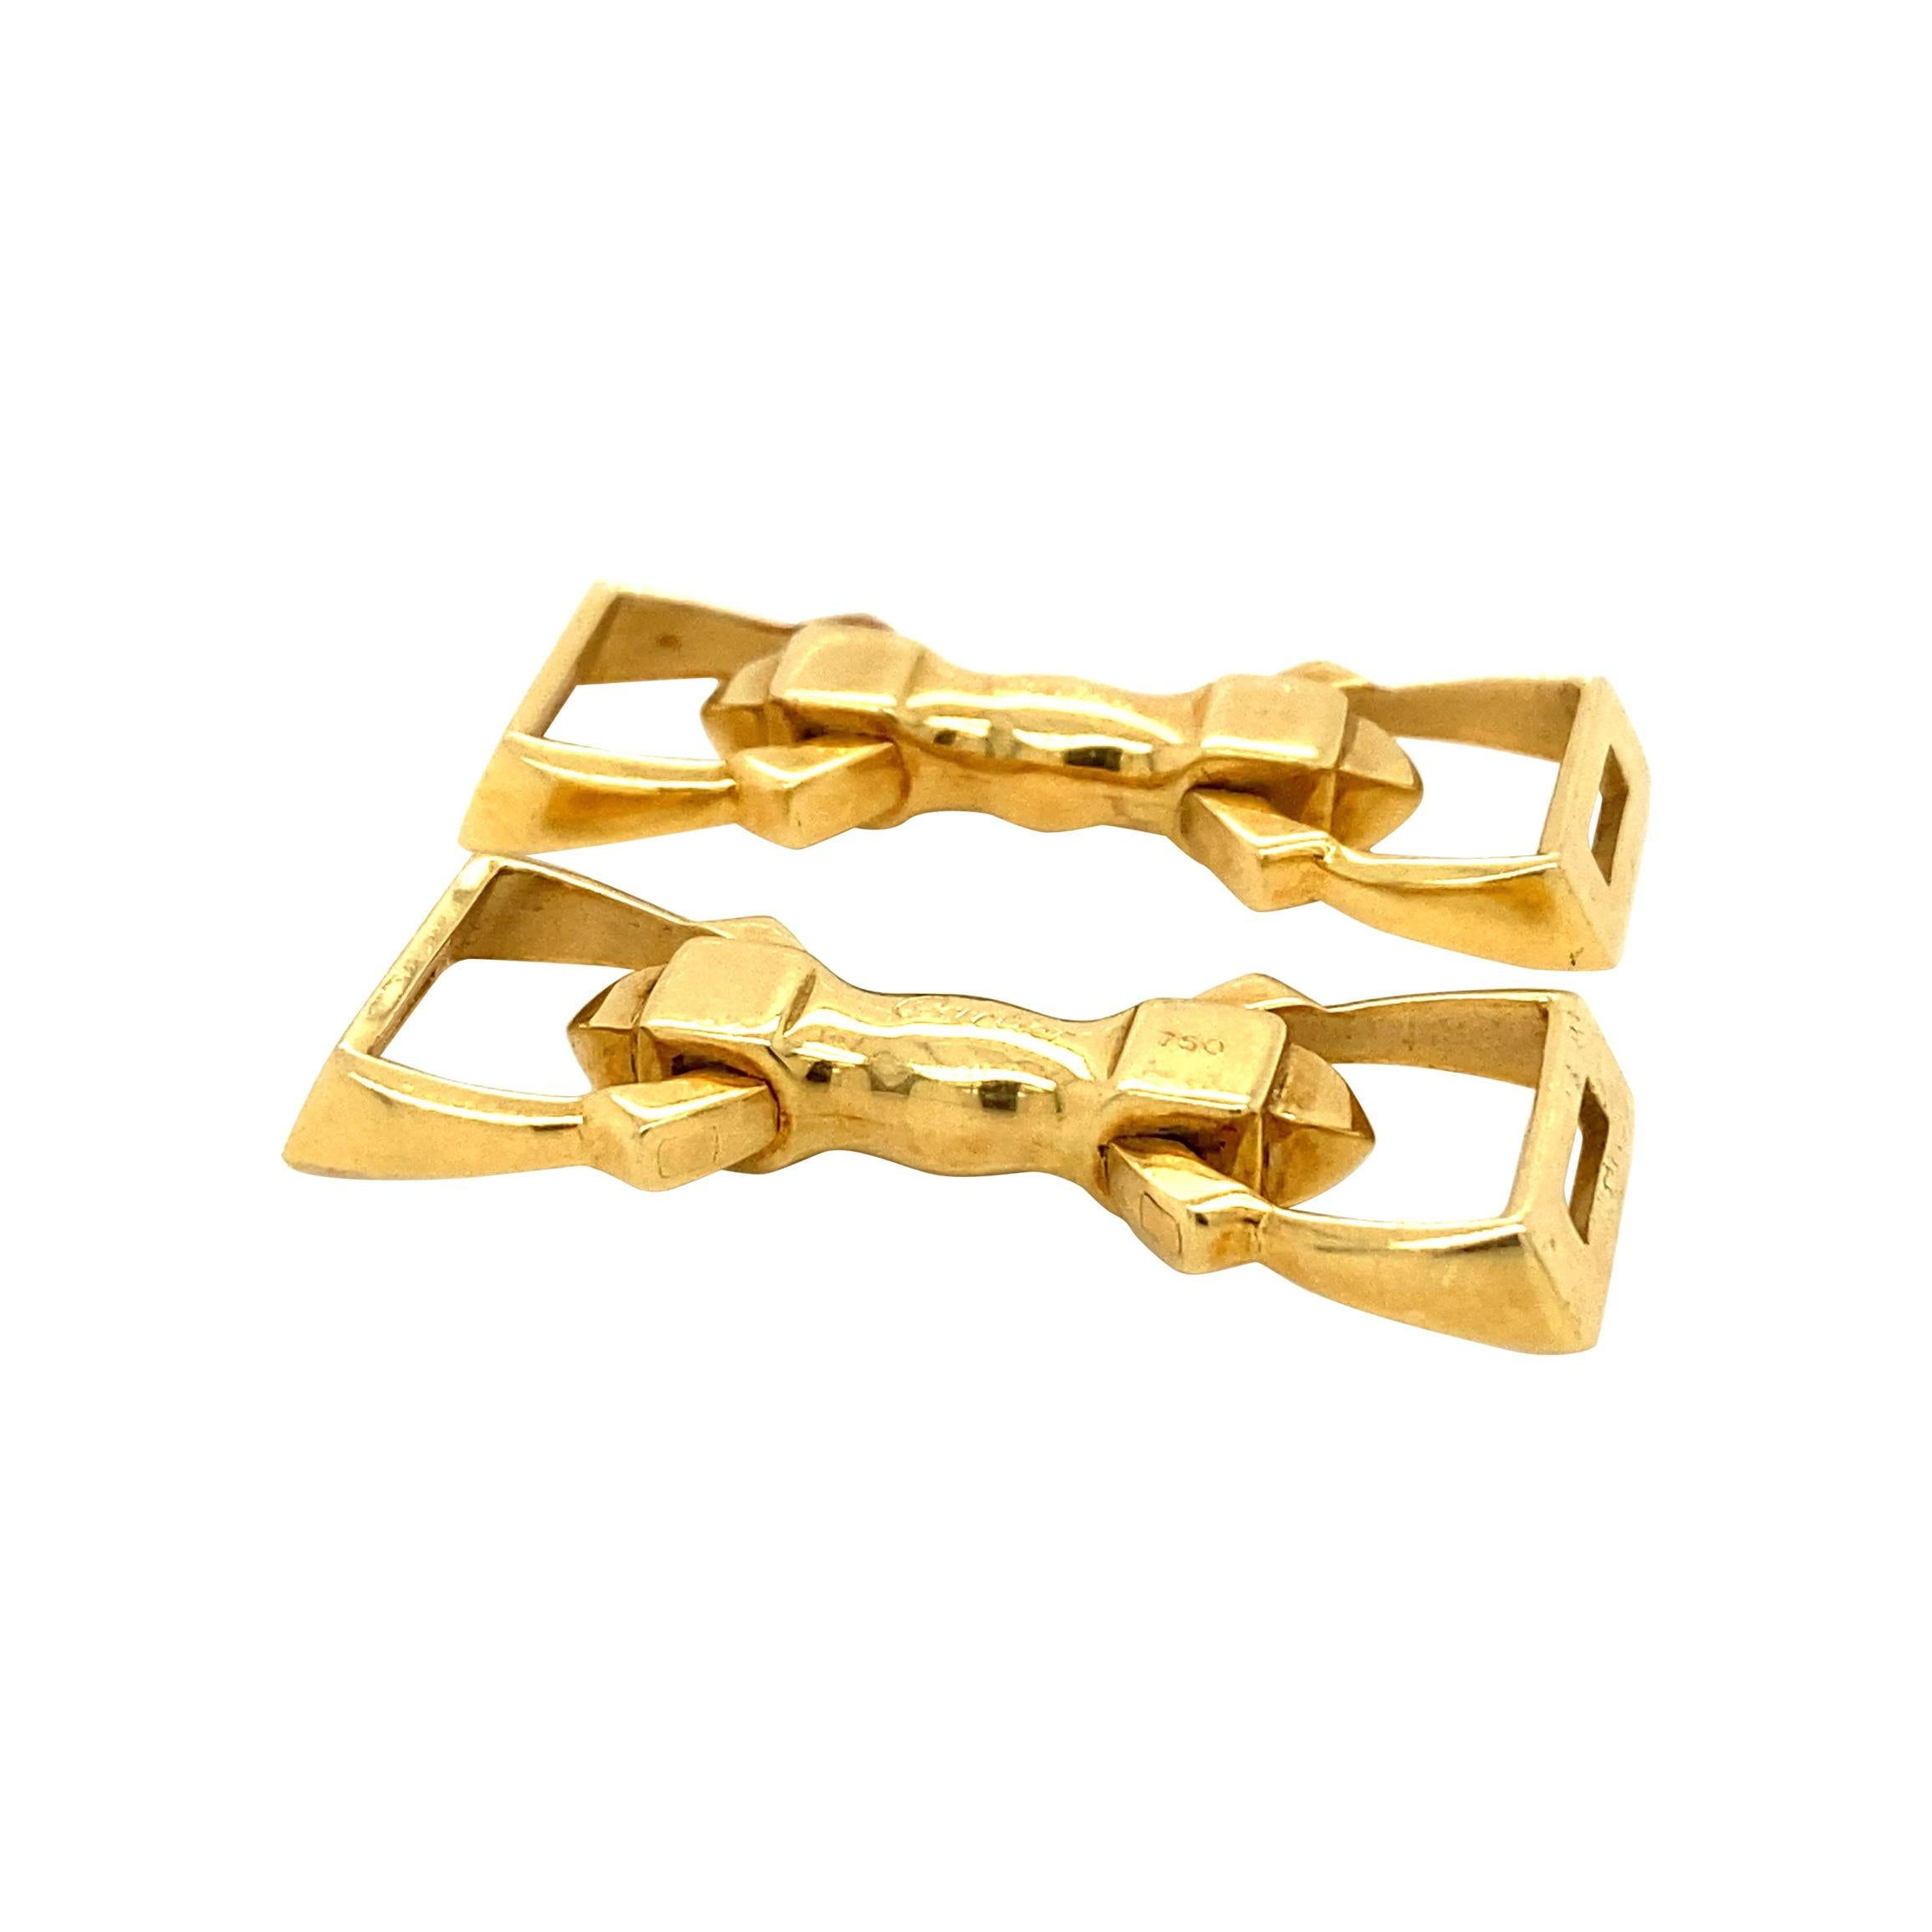 Cartier 18 Carat Gold Stirrup Cufflinks, circa 1935